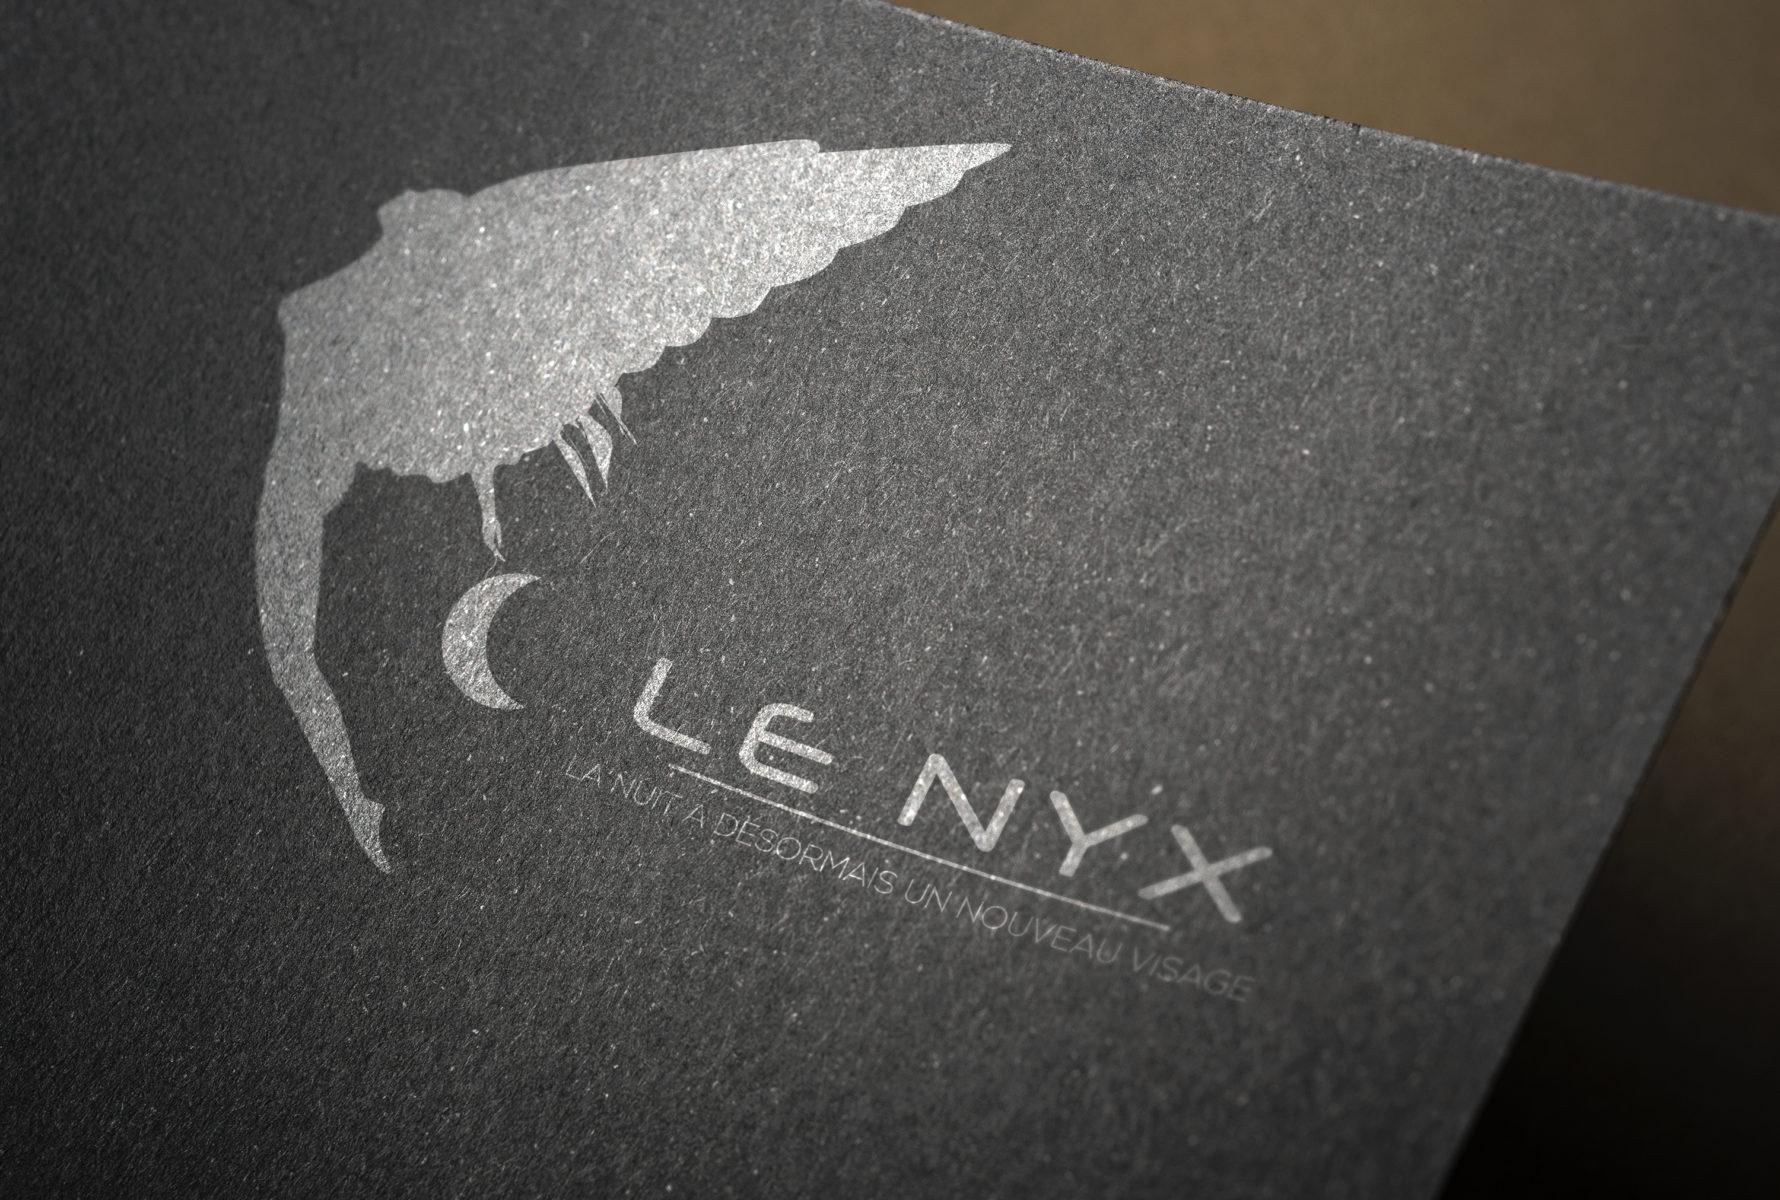 carte de visite le nyx